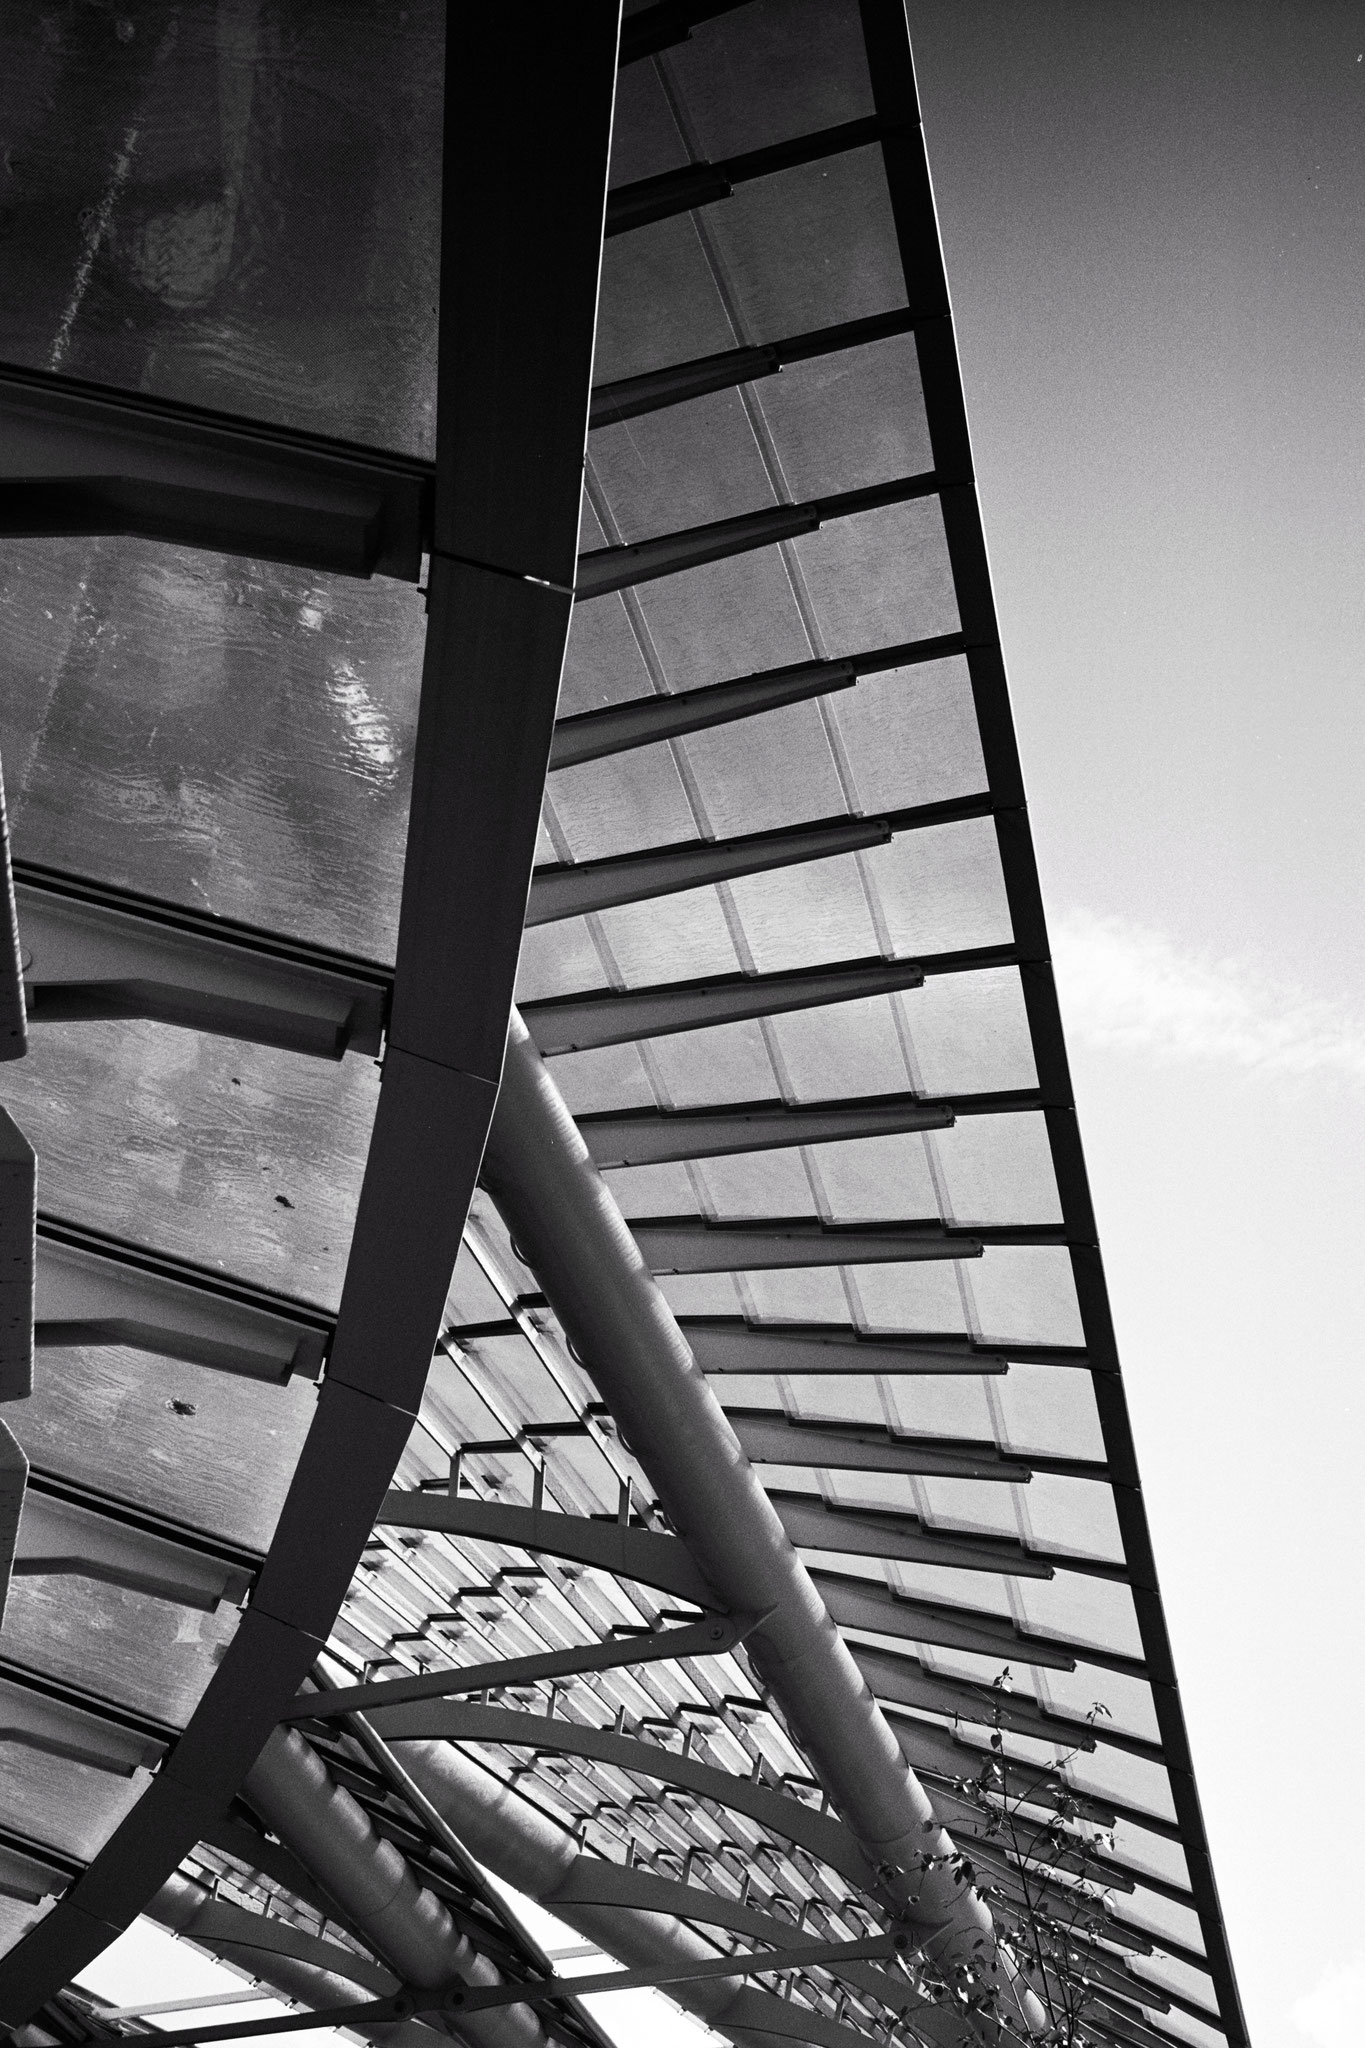 """Iron wings"" - Châtelet-Les-Halles, Paris (2021). Rollei Blackbird Creative 64 ASA. © Clémence Rougetet"